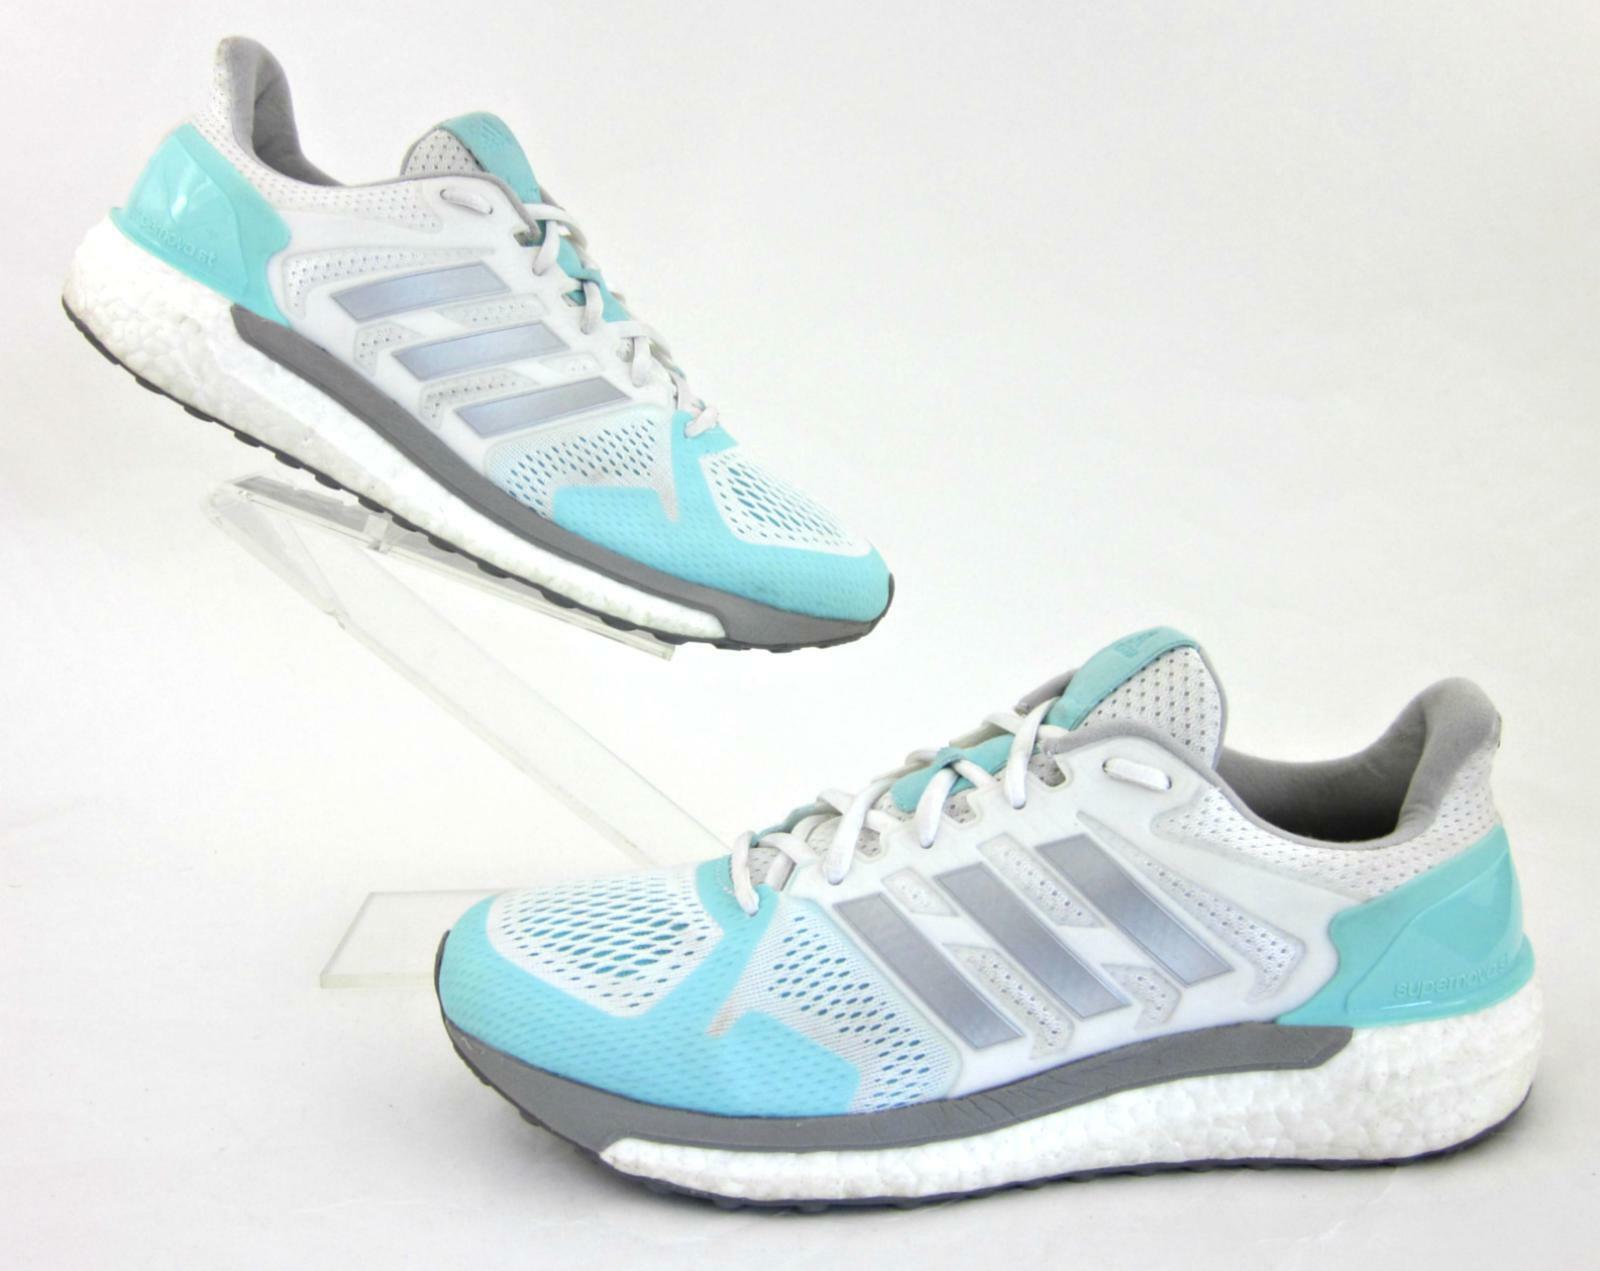 Adidas Supernova ST Boost Womens Running shoes White   Silver   Aqua US 9.5